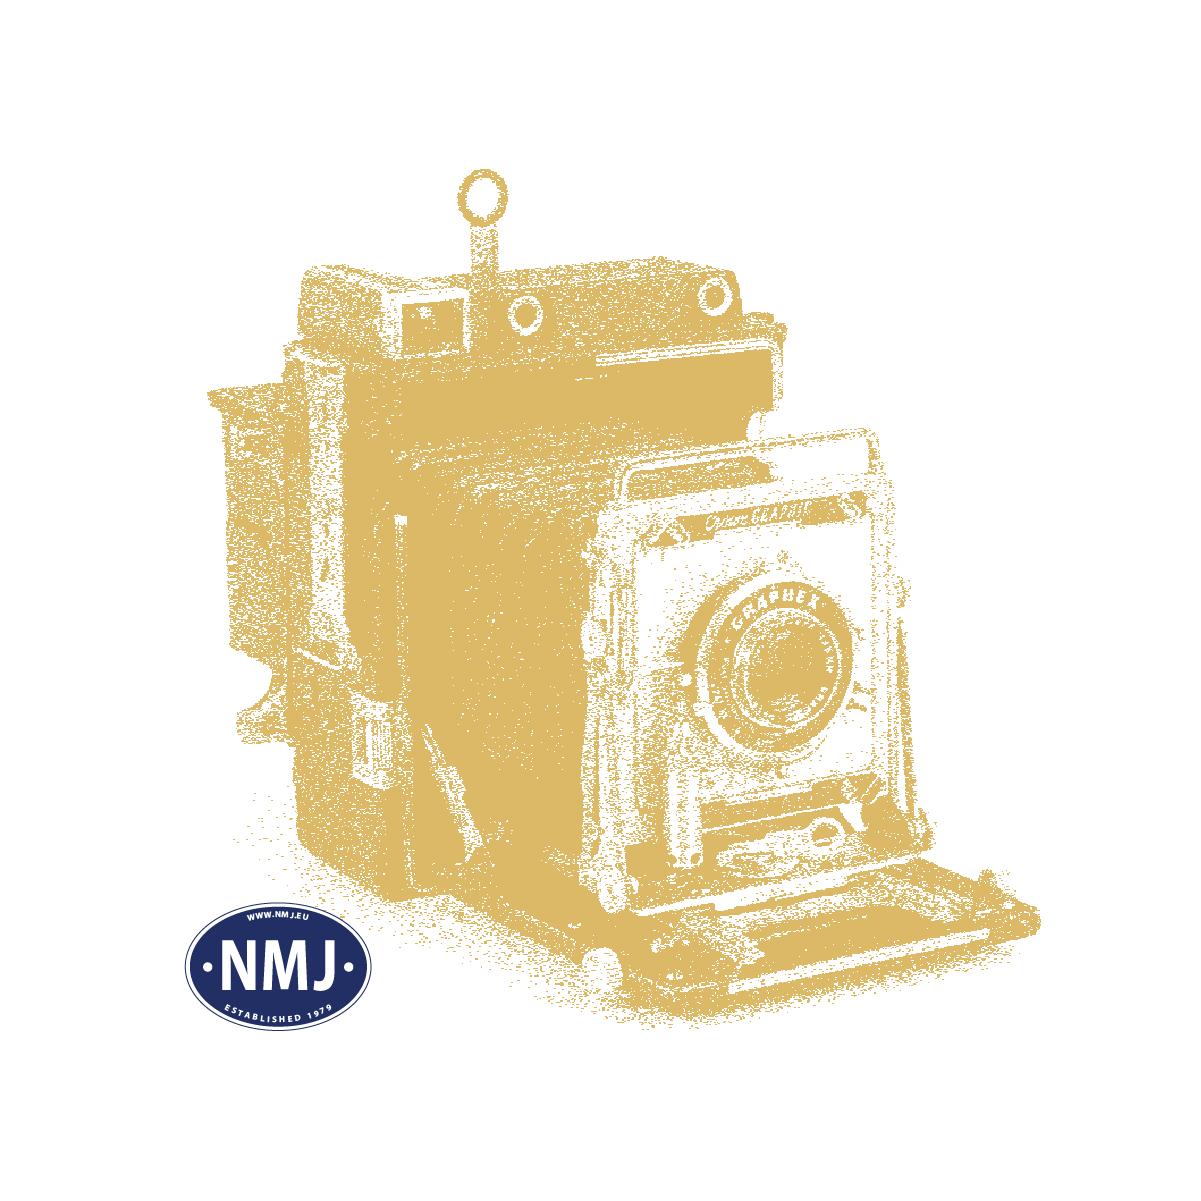 NMJT604.501 - NMJ Topline TGOJ F6 170, Sykkelvogn